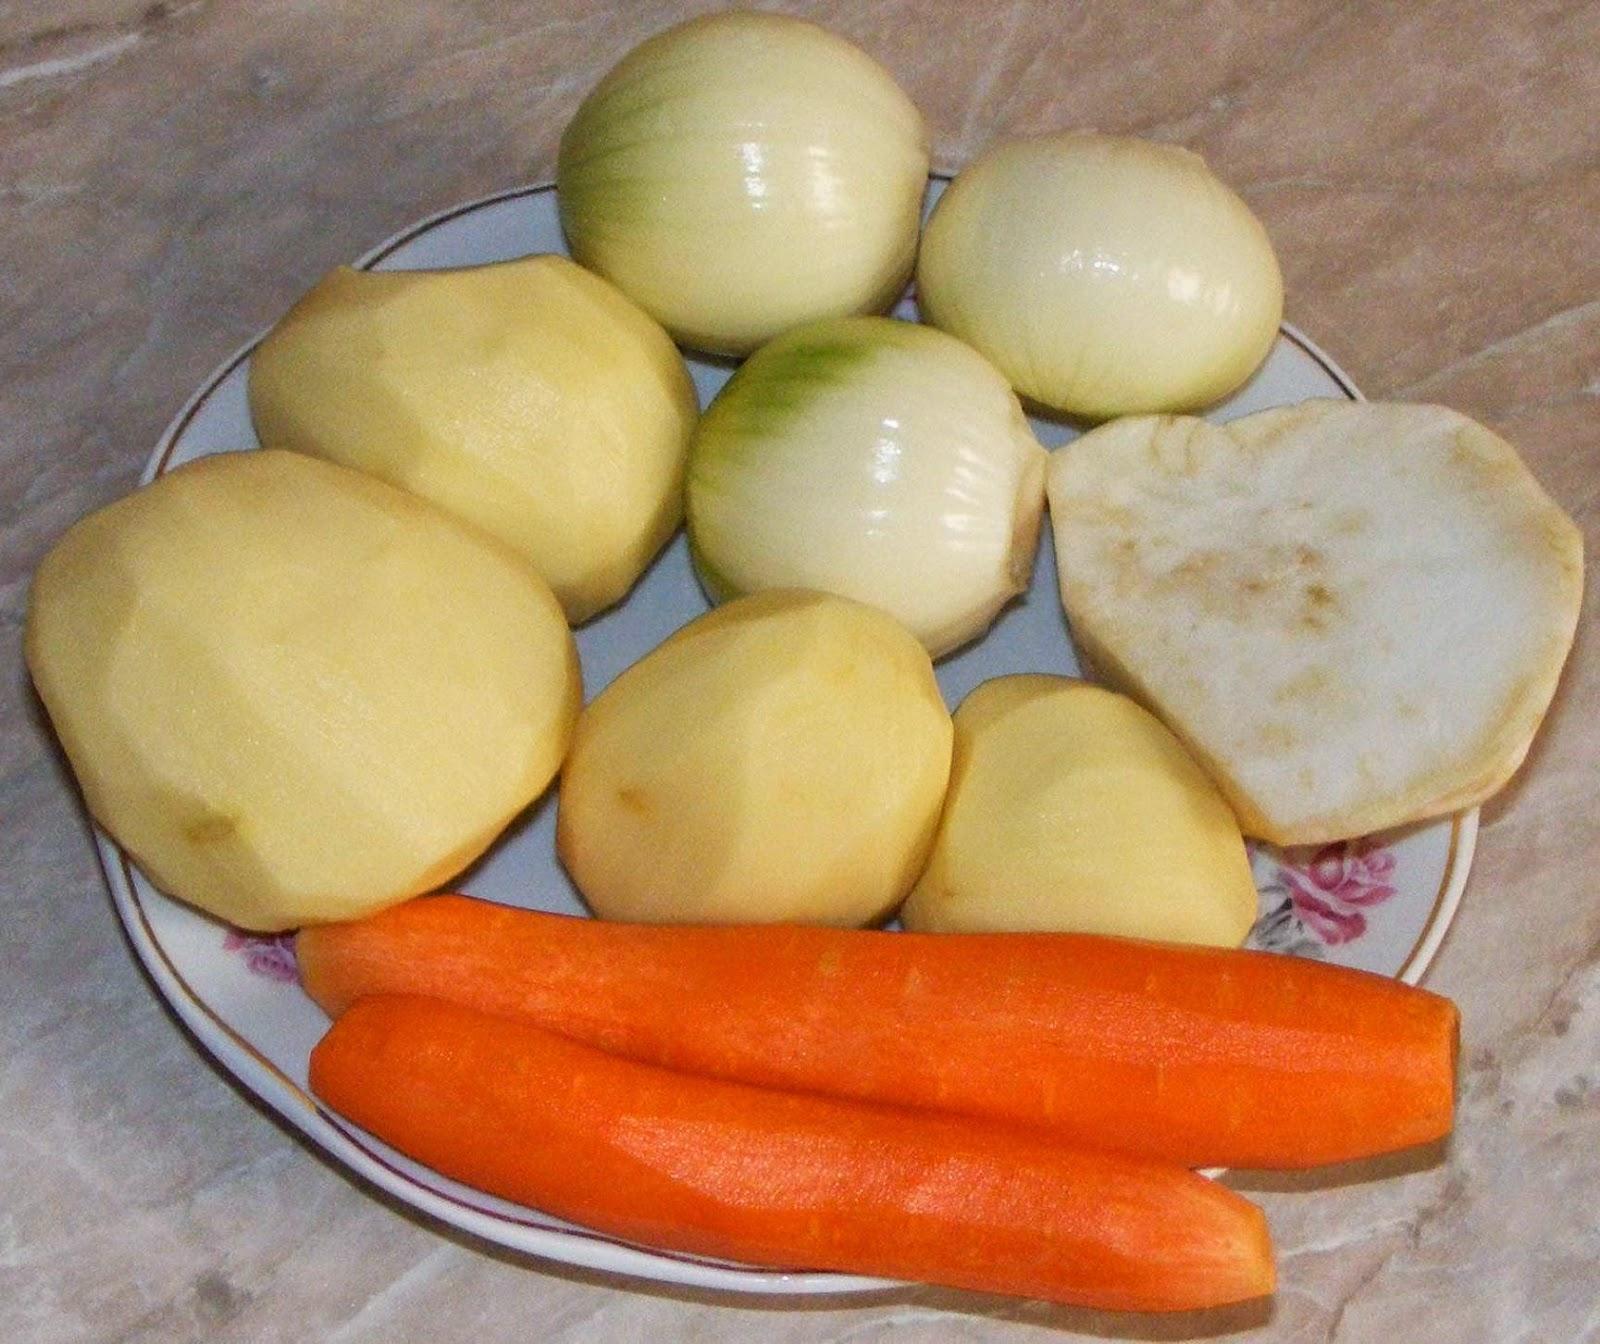 legume, legume pentru mancare, legume pentru ciorba, legume proaspete, cartofi, ceapa, morcovi, telina, retete cu legume, retete si preparate culinare cu legume, retete de mancare,